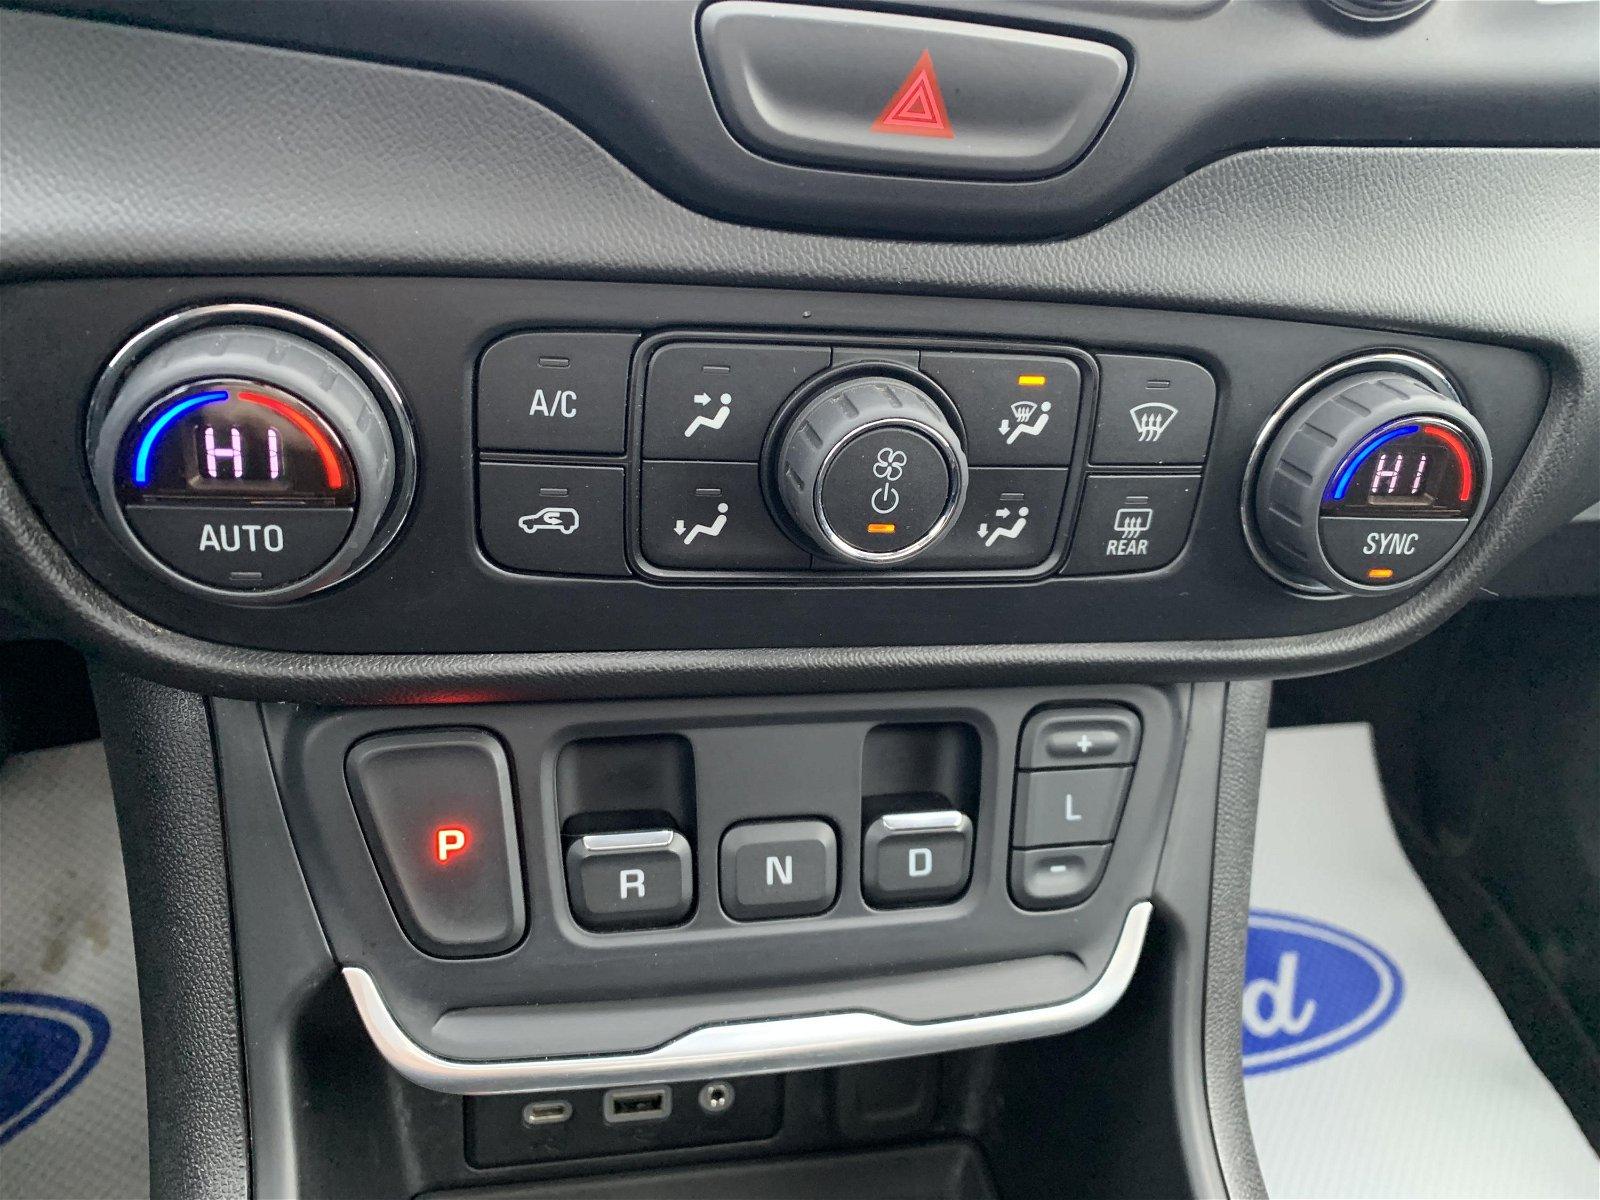 2019 GMC Terrain SLE AWD Sunroof